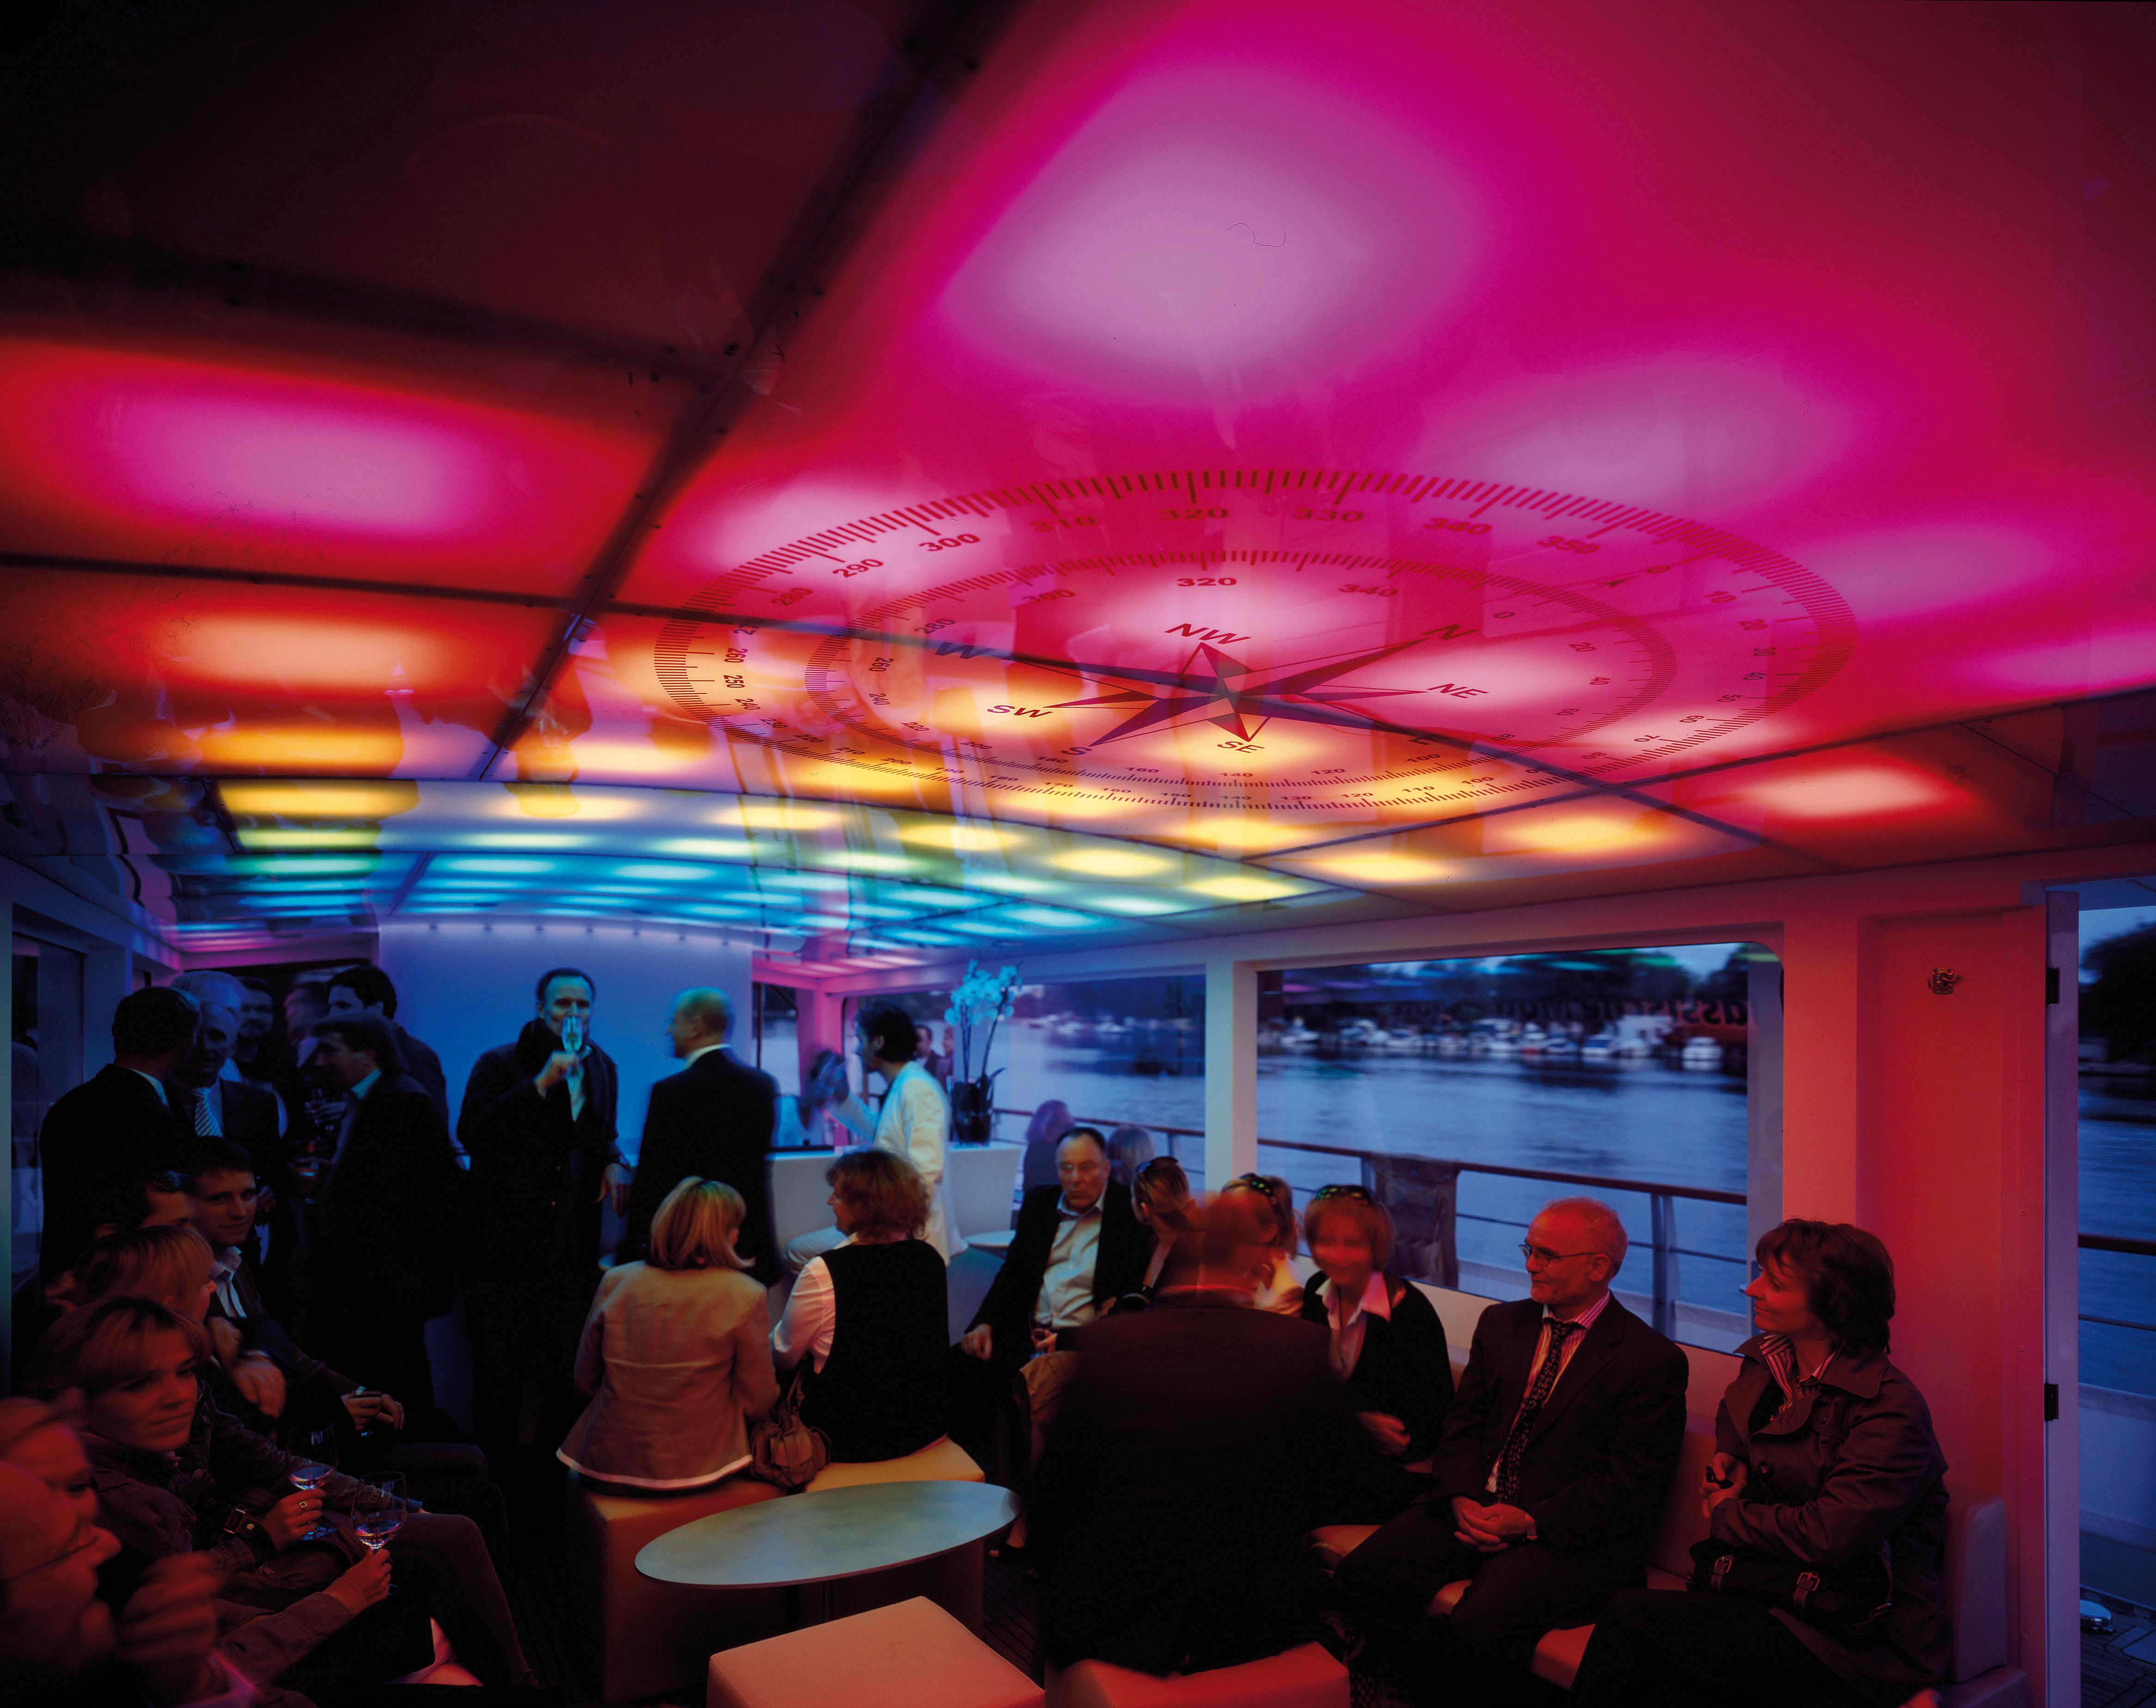 SunCat 58 Lichtspiele Kompassrose